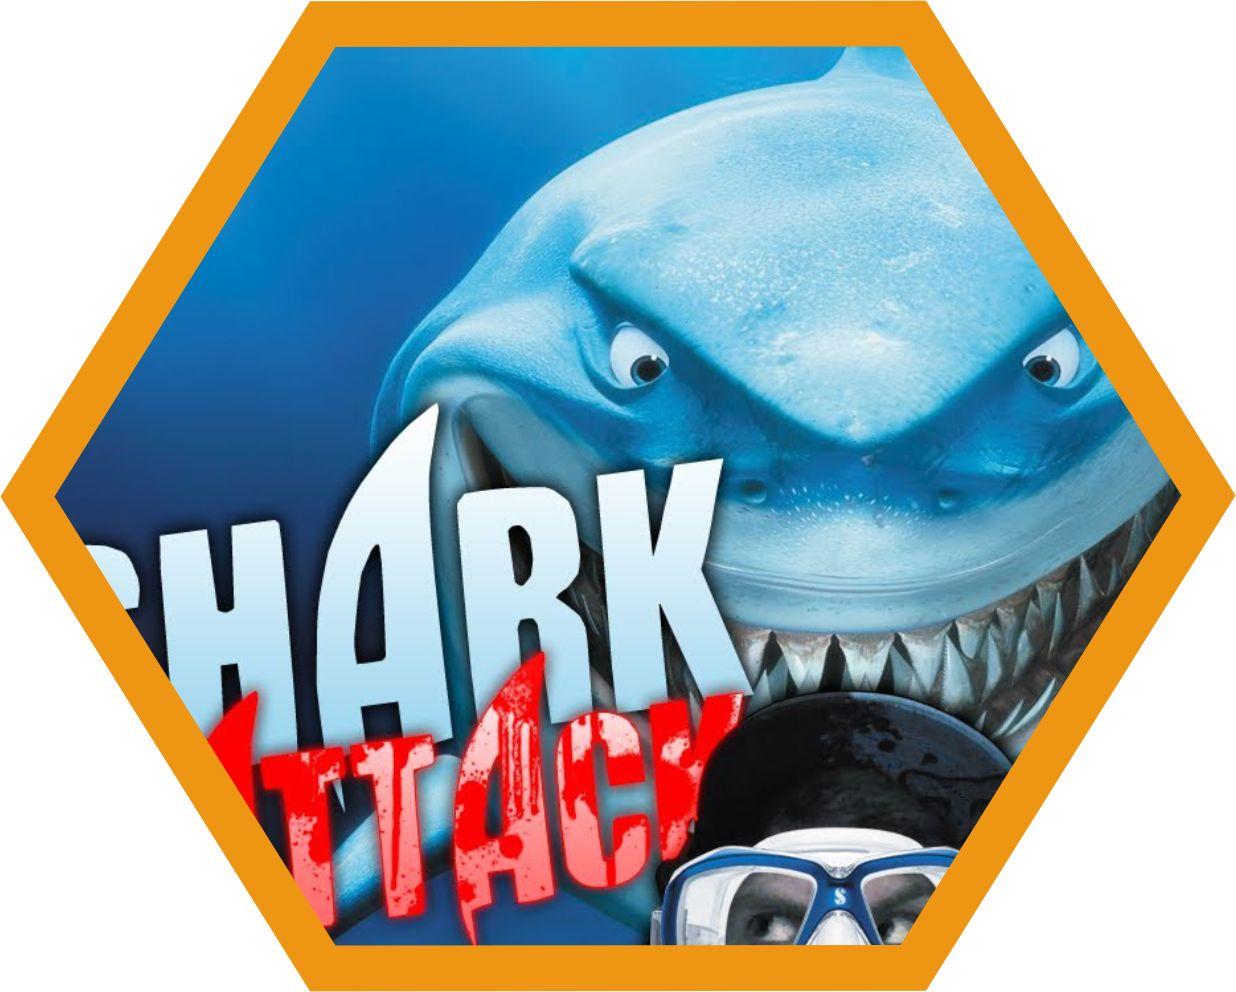 sharkCard_Puzzard_AugmentedReality